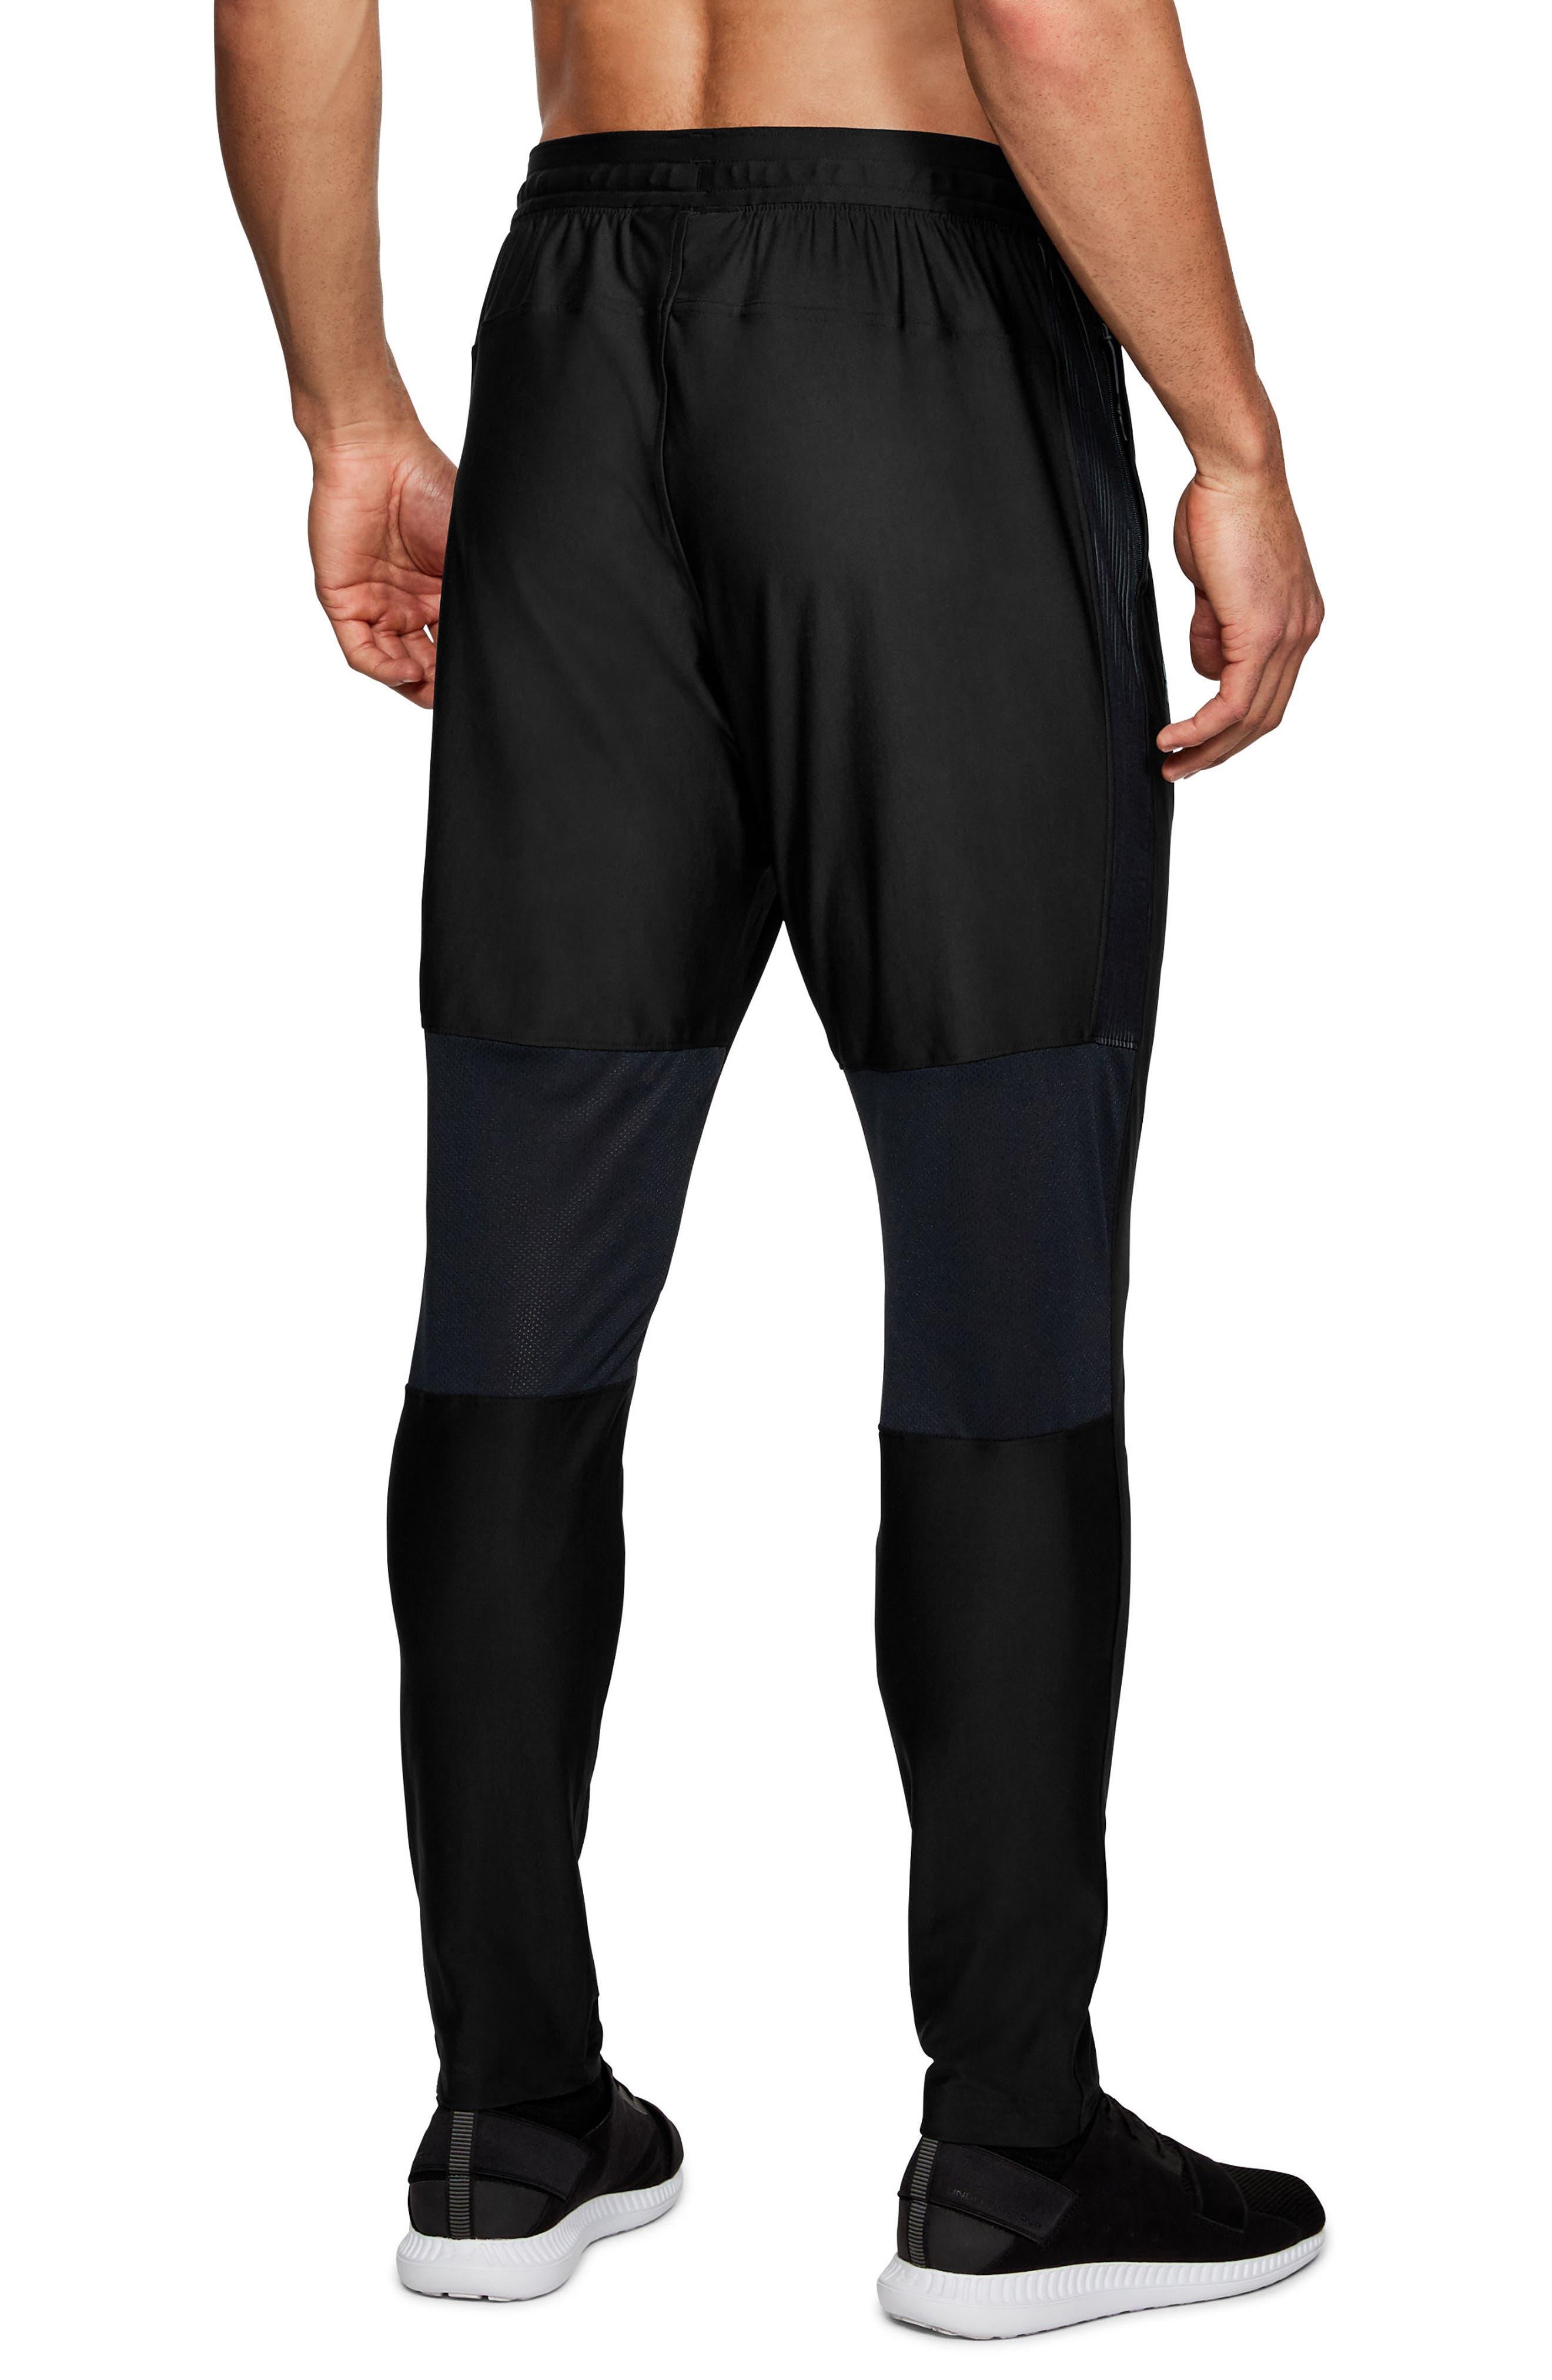 Threadborne Vanish Pants,                             Alternate thumbnail 2, color,                             Black/ Anthracite